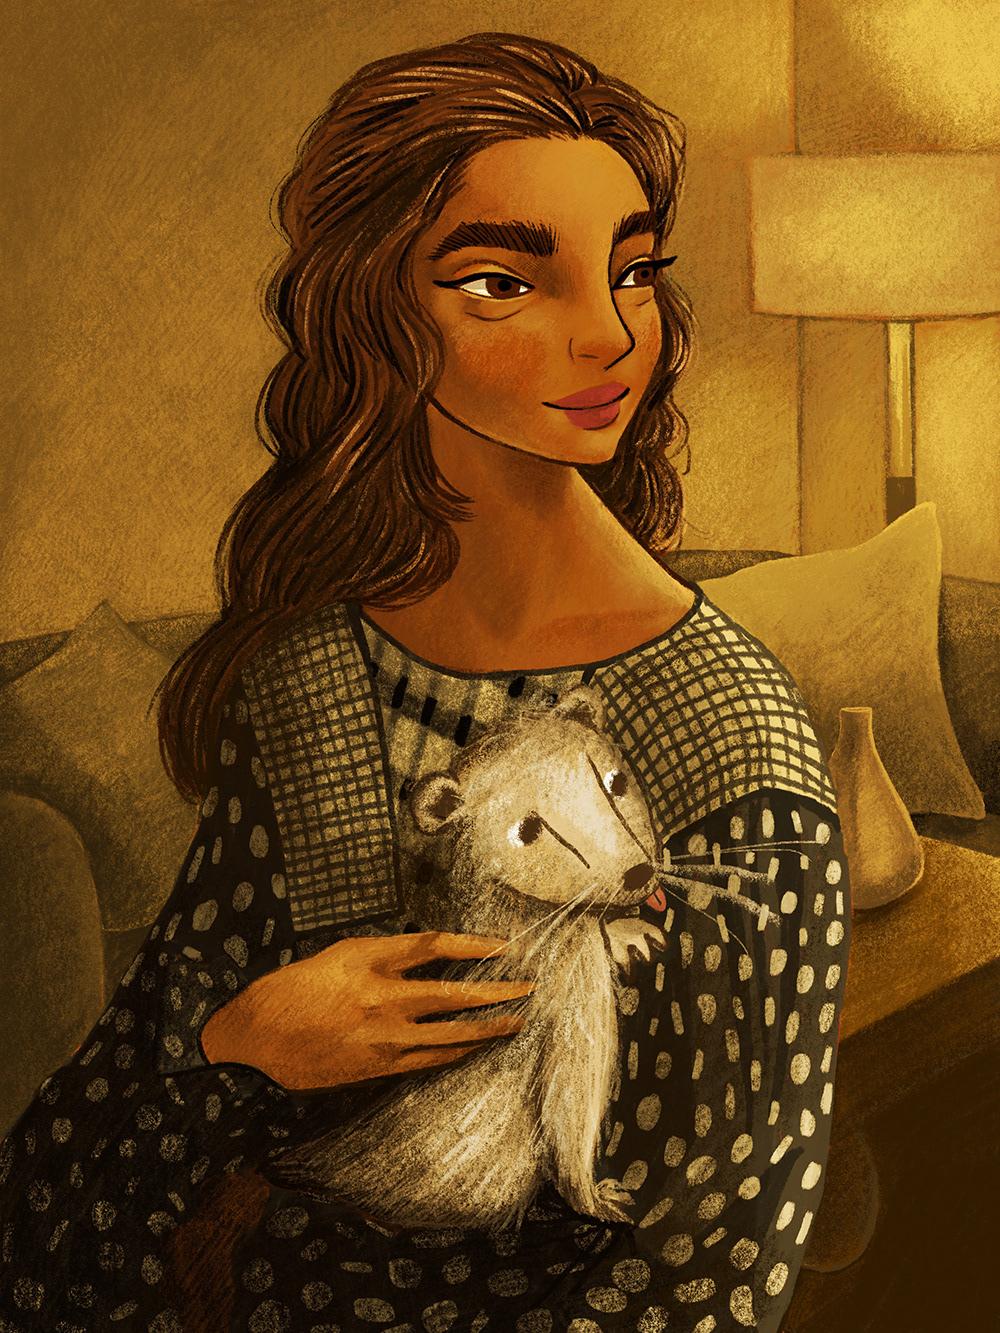 kidlitart Monochromatic Painting portrait illustration Storybook art